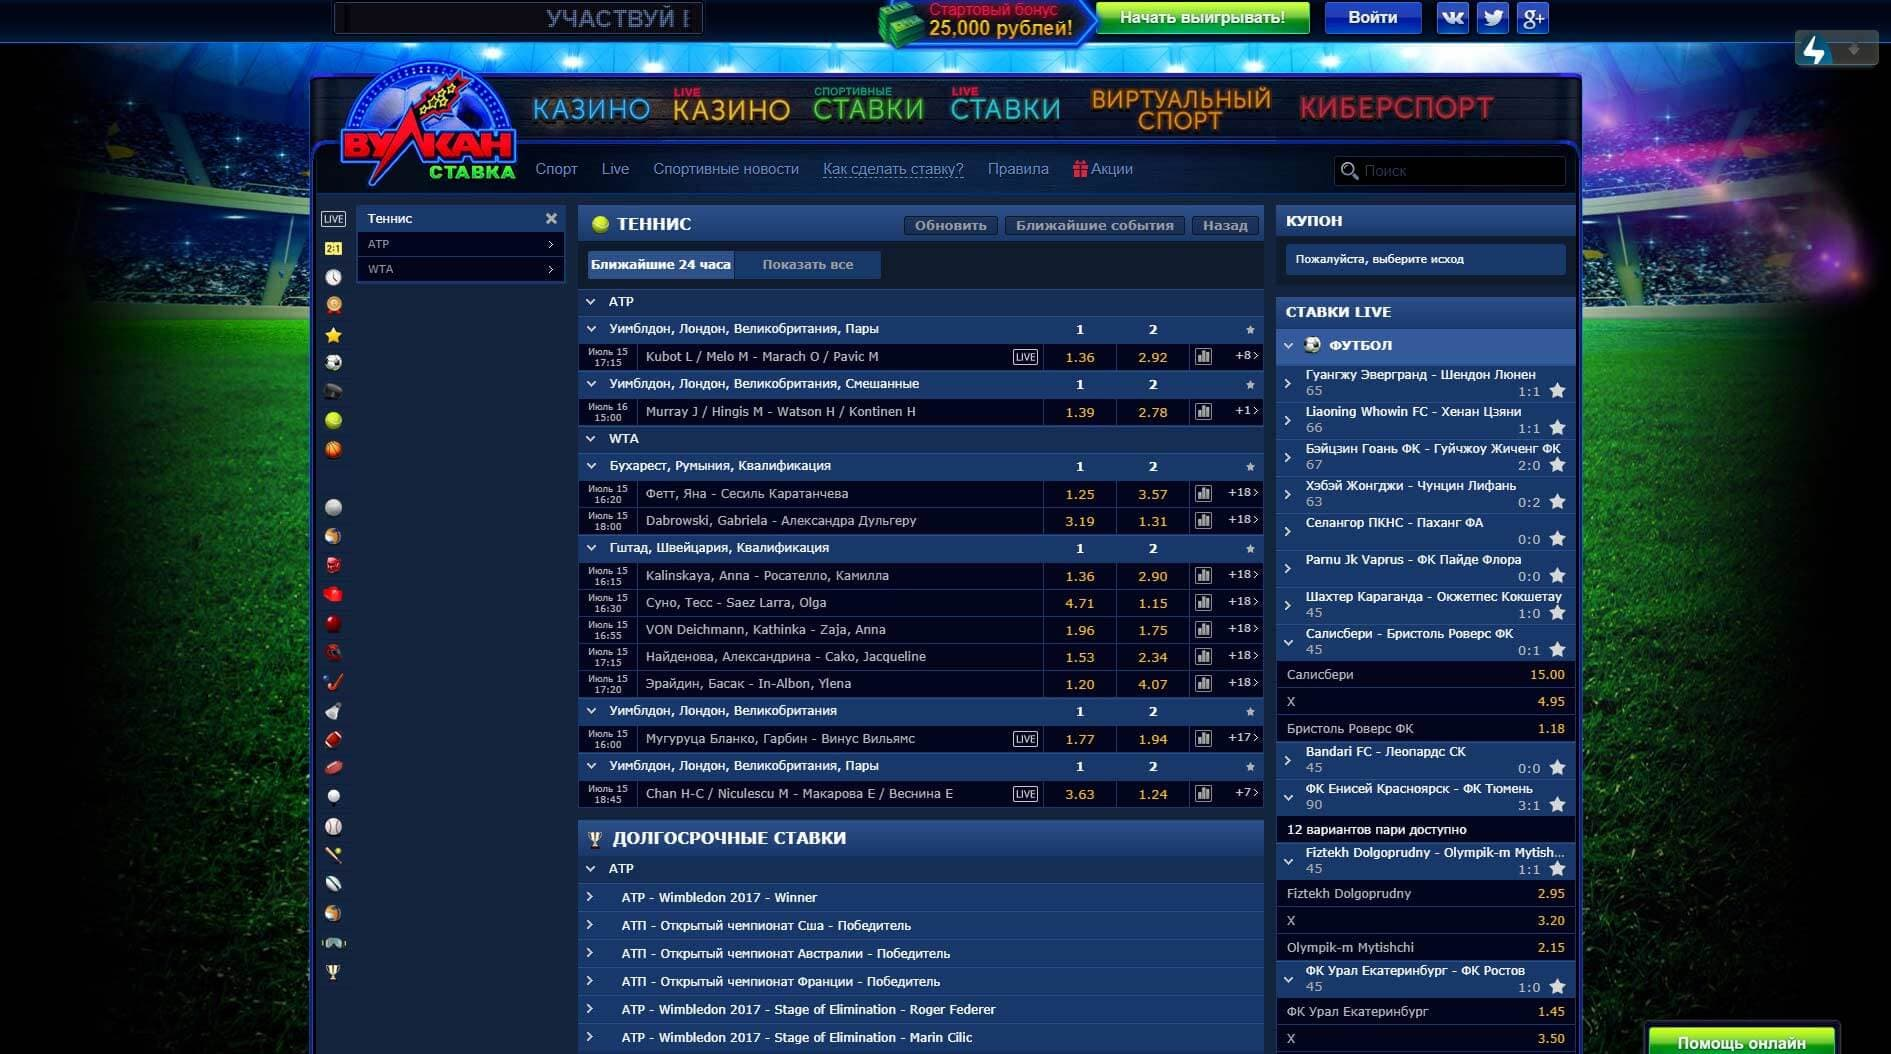 онлайн казино vulkan stavka актуальное зеркало